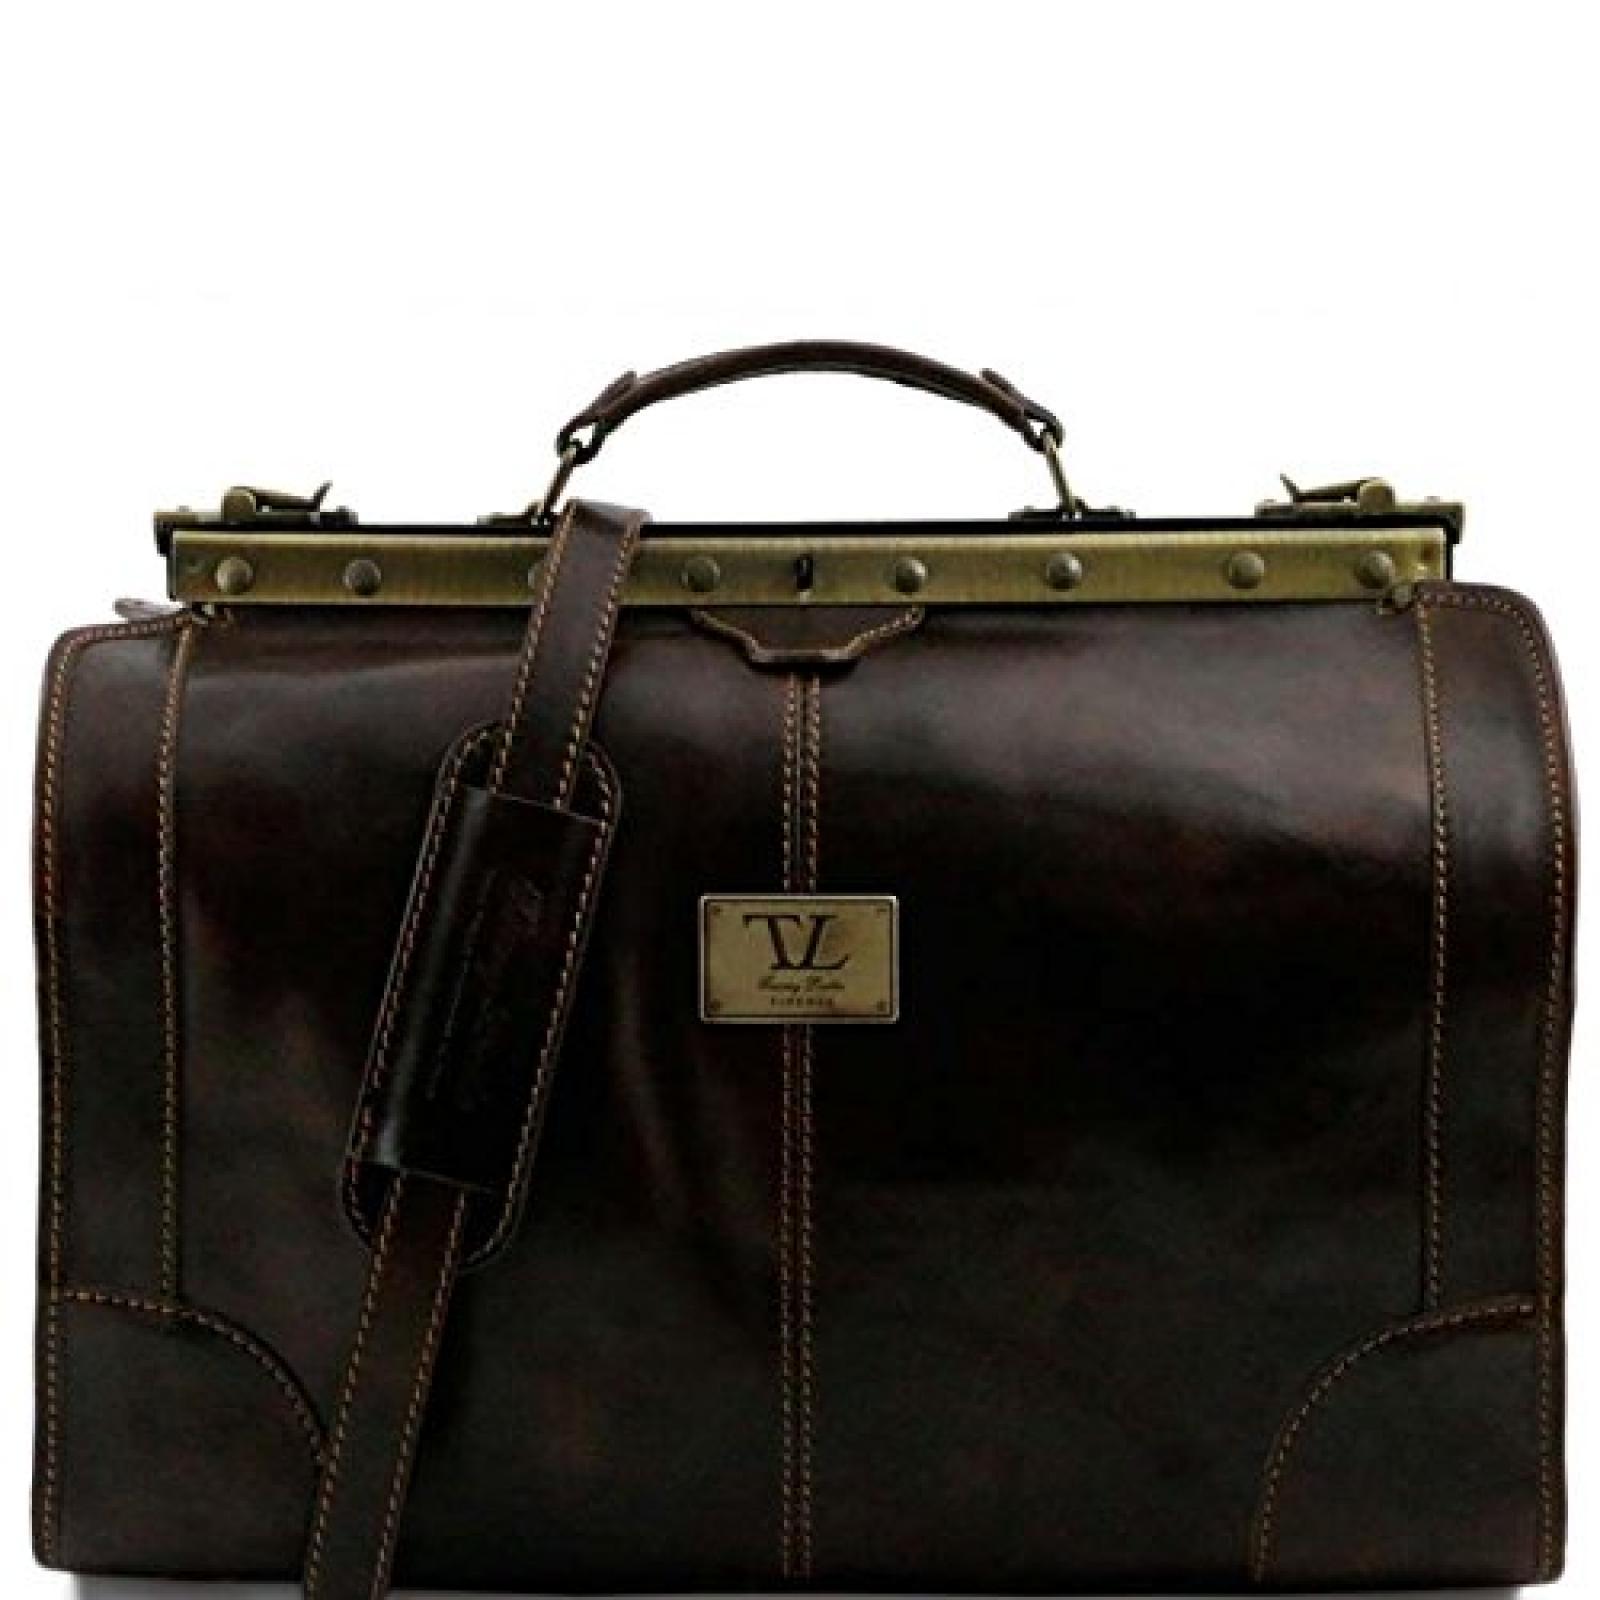 Tuscany Leather - Madrid - Maulbügelreisetasche aus Leder - Klein Dunkelbraun - TL1023/5